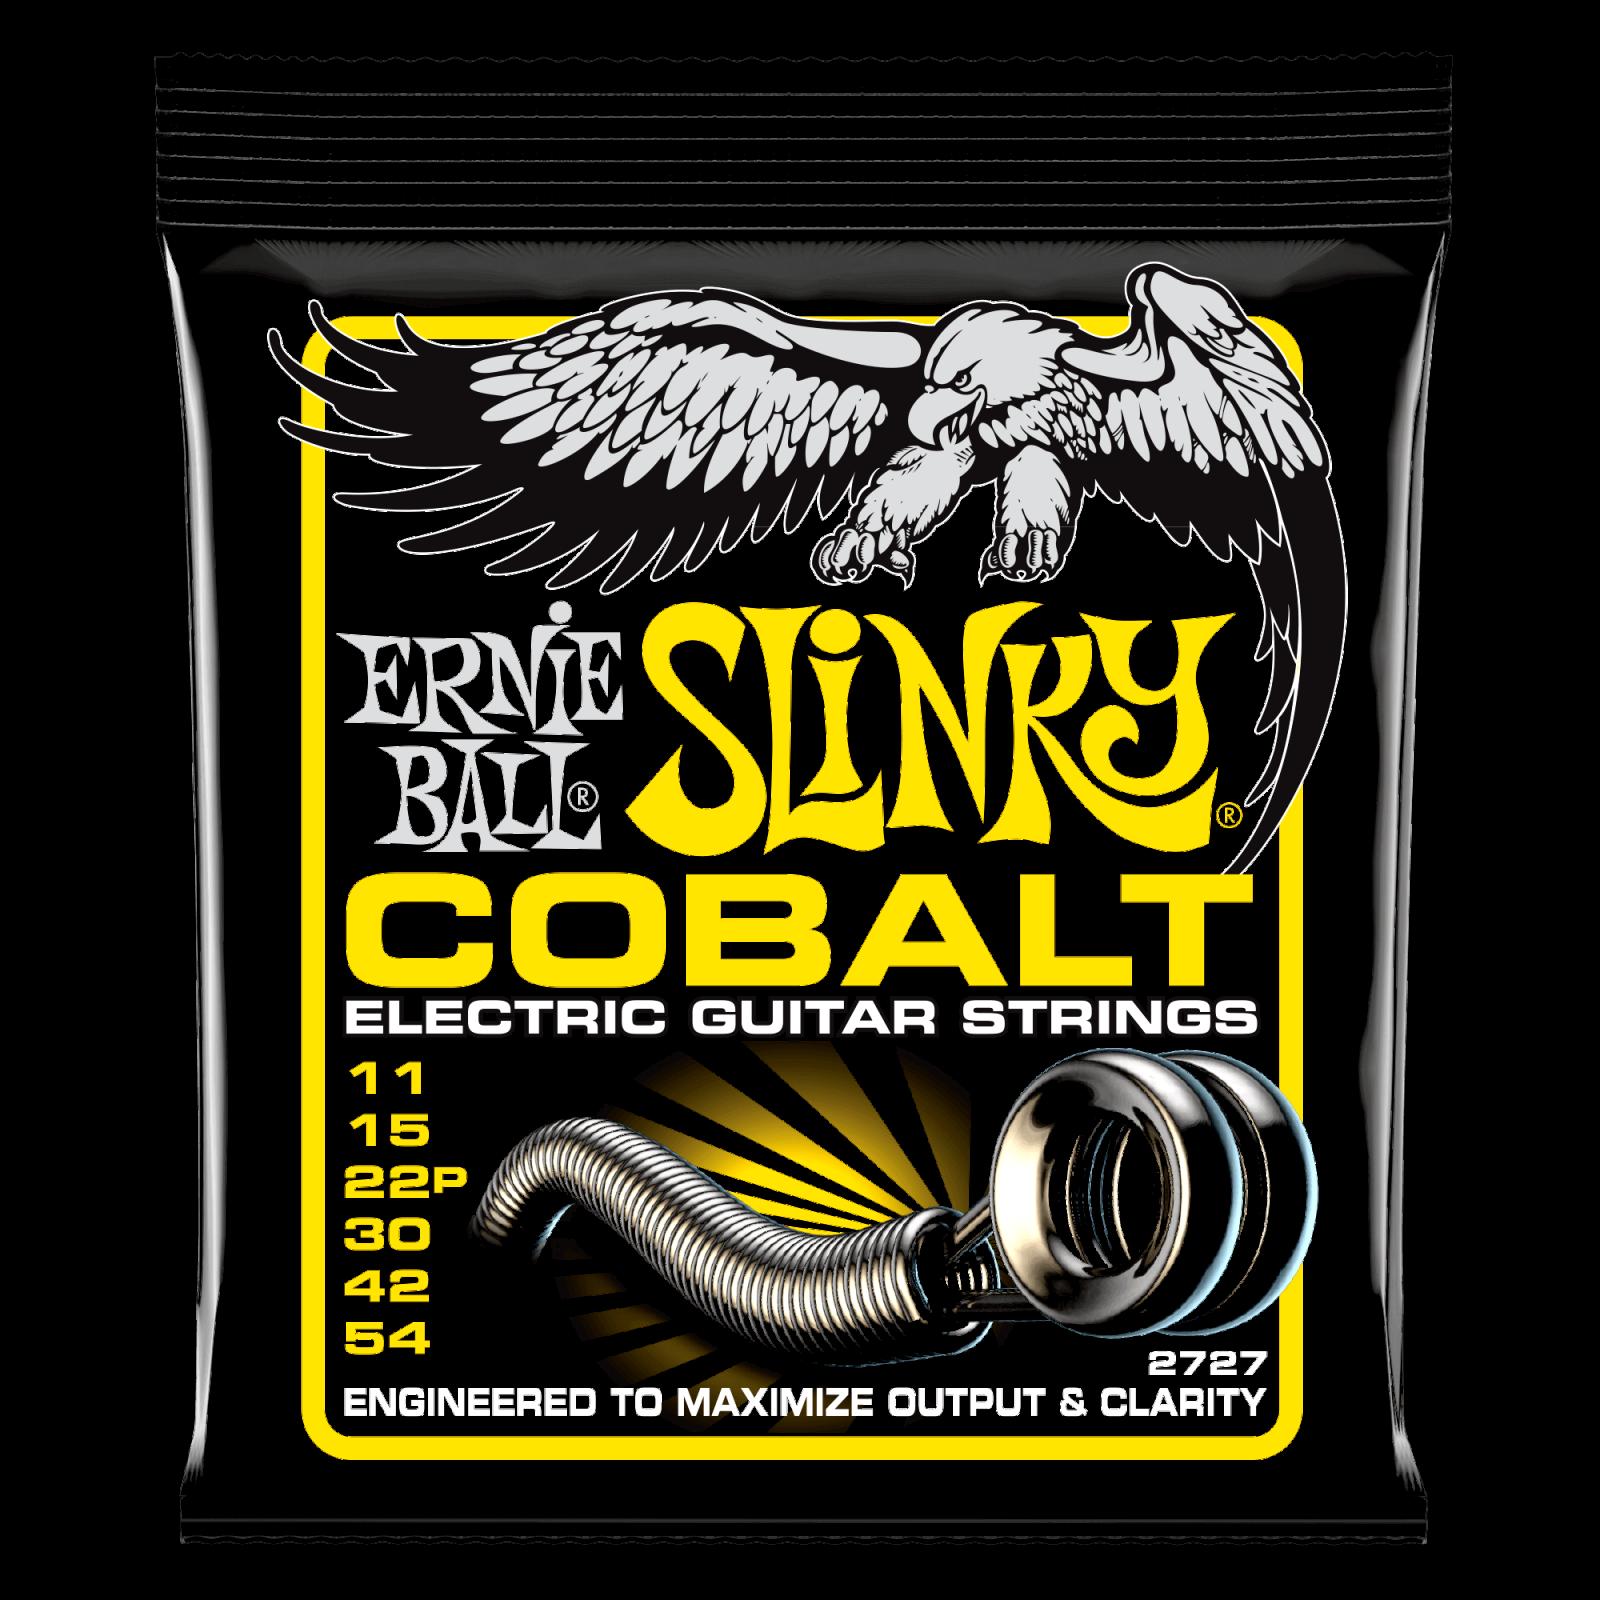 Ernie Ball Cobalt Beefy Slinky Electric Guitar Strings 11-54 P02727